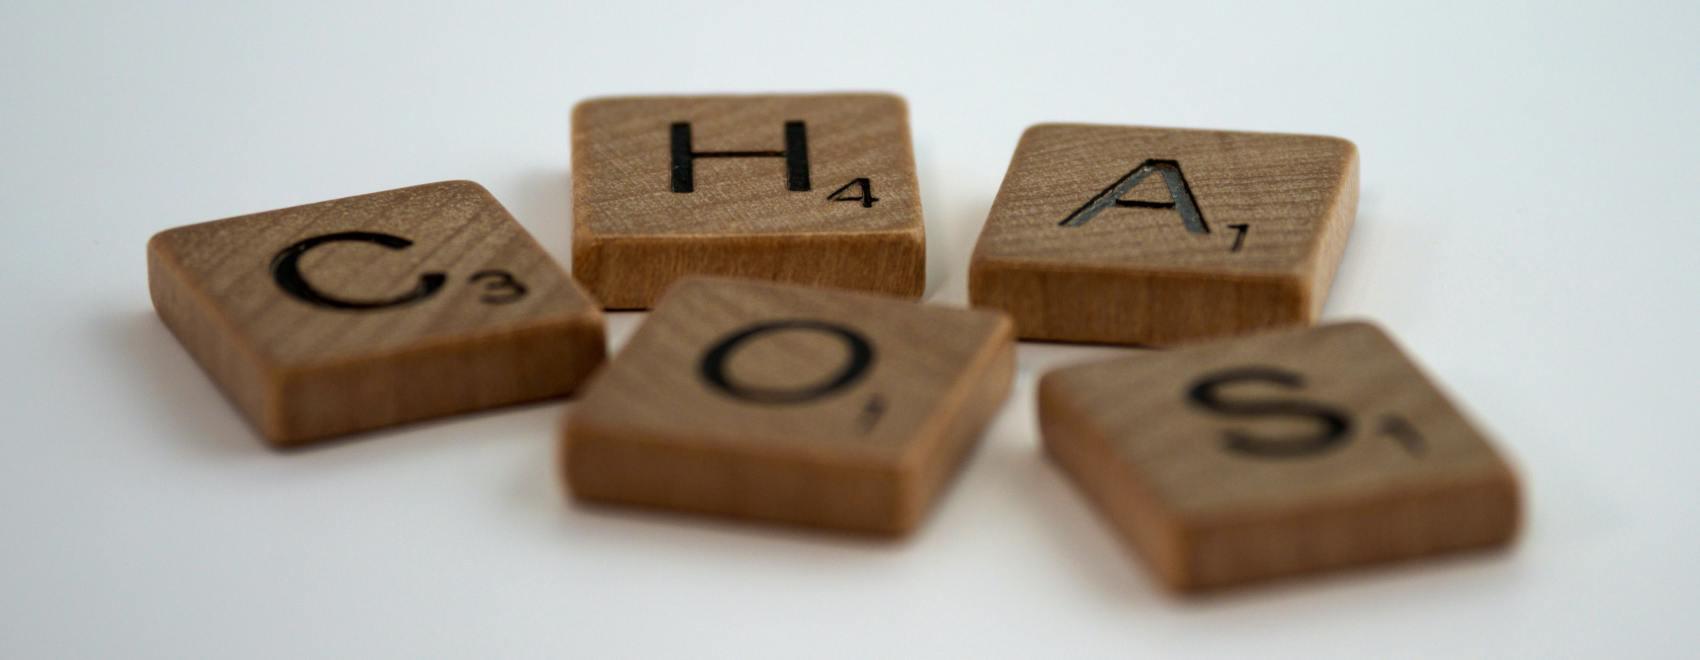 scrabble tiles spelling chaos